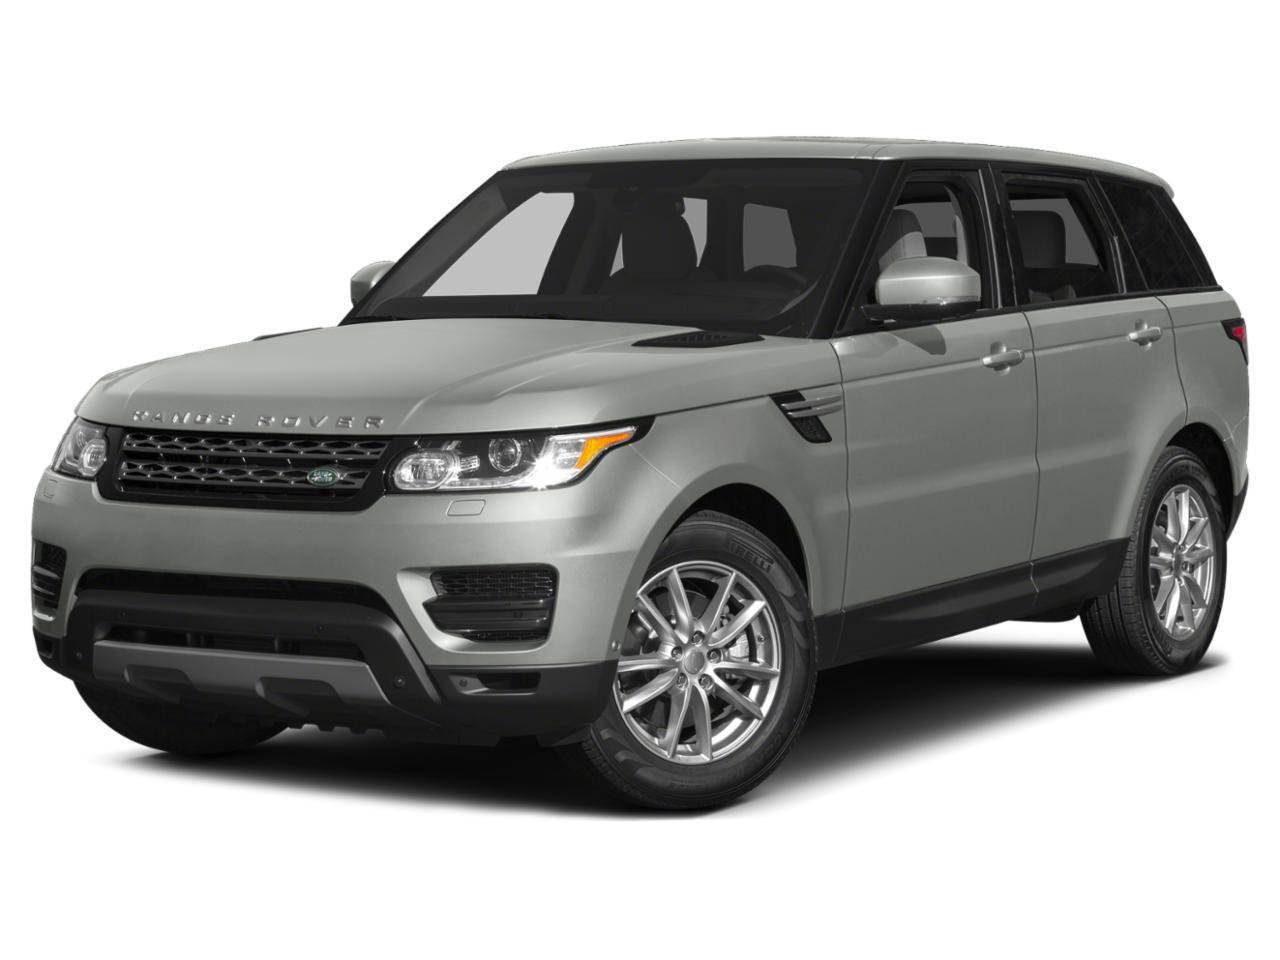 2015 Land Rover Range Rover Sport Vehicle Photo in Ocala, FL 34474